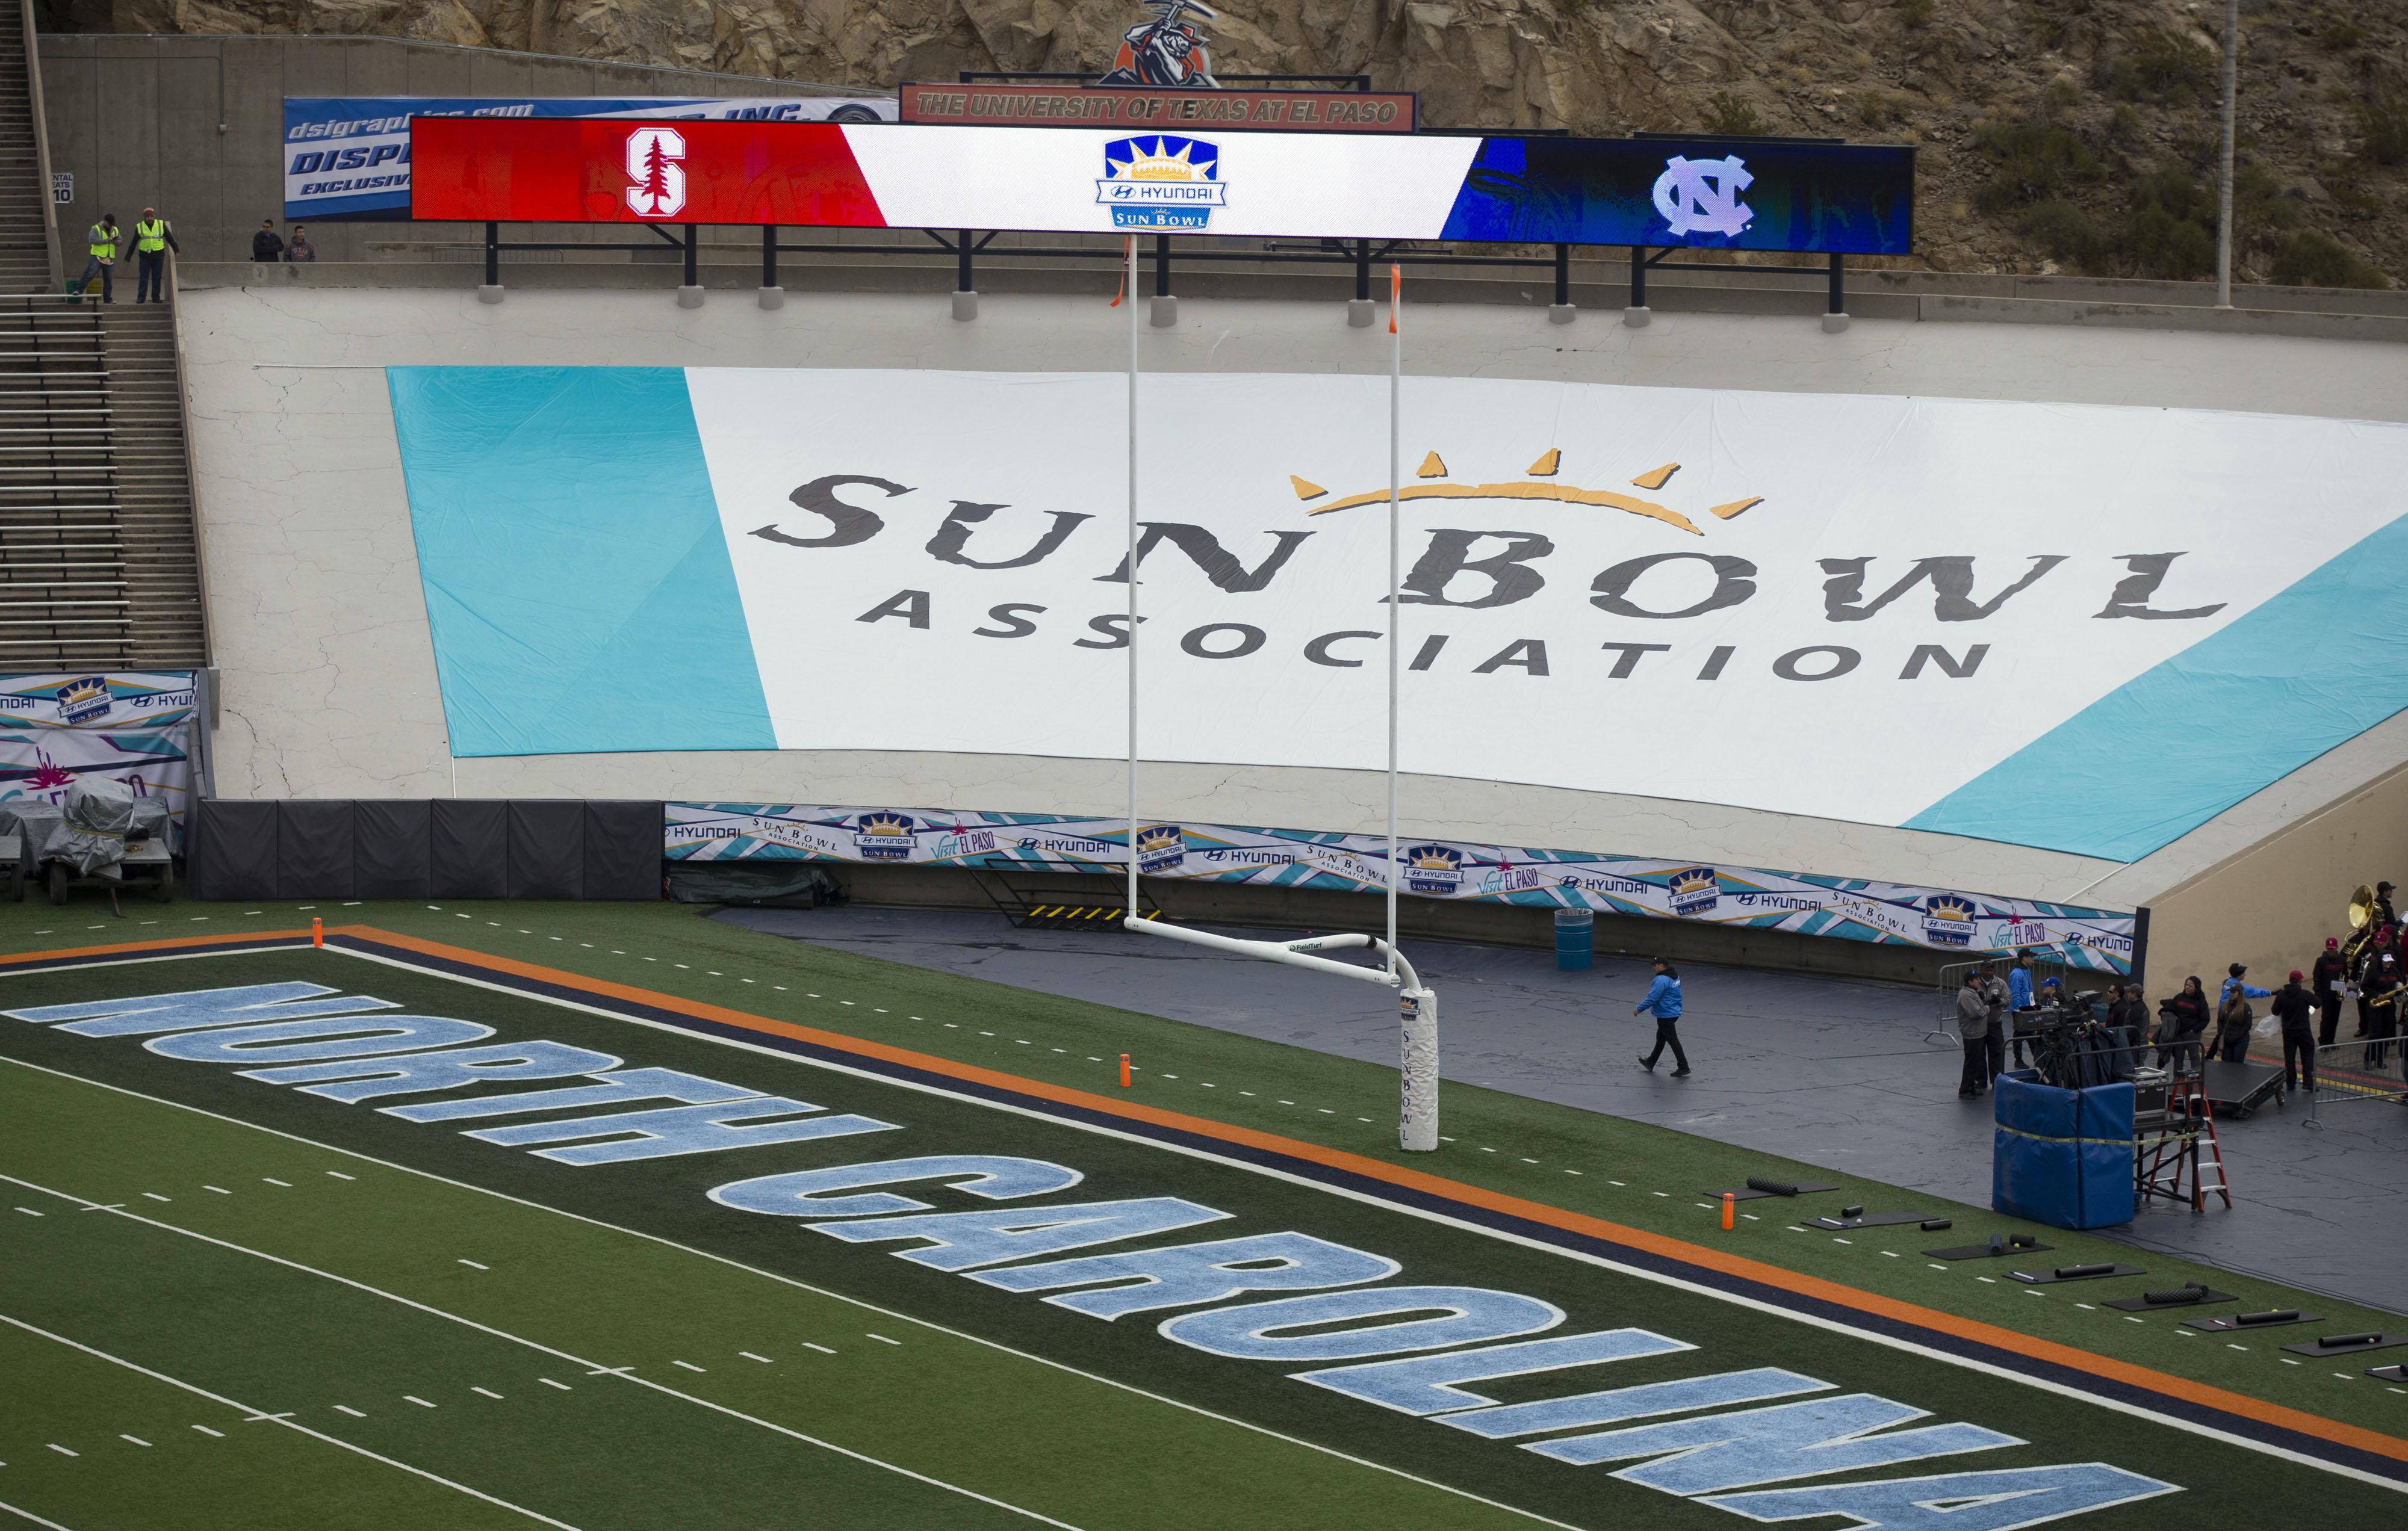 9777102-ncaa-football-sun-bowl-stanford-vs-north-carolina